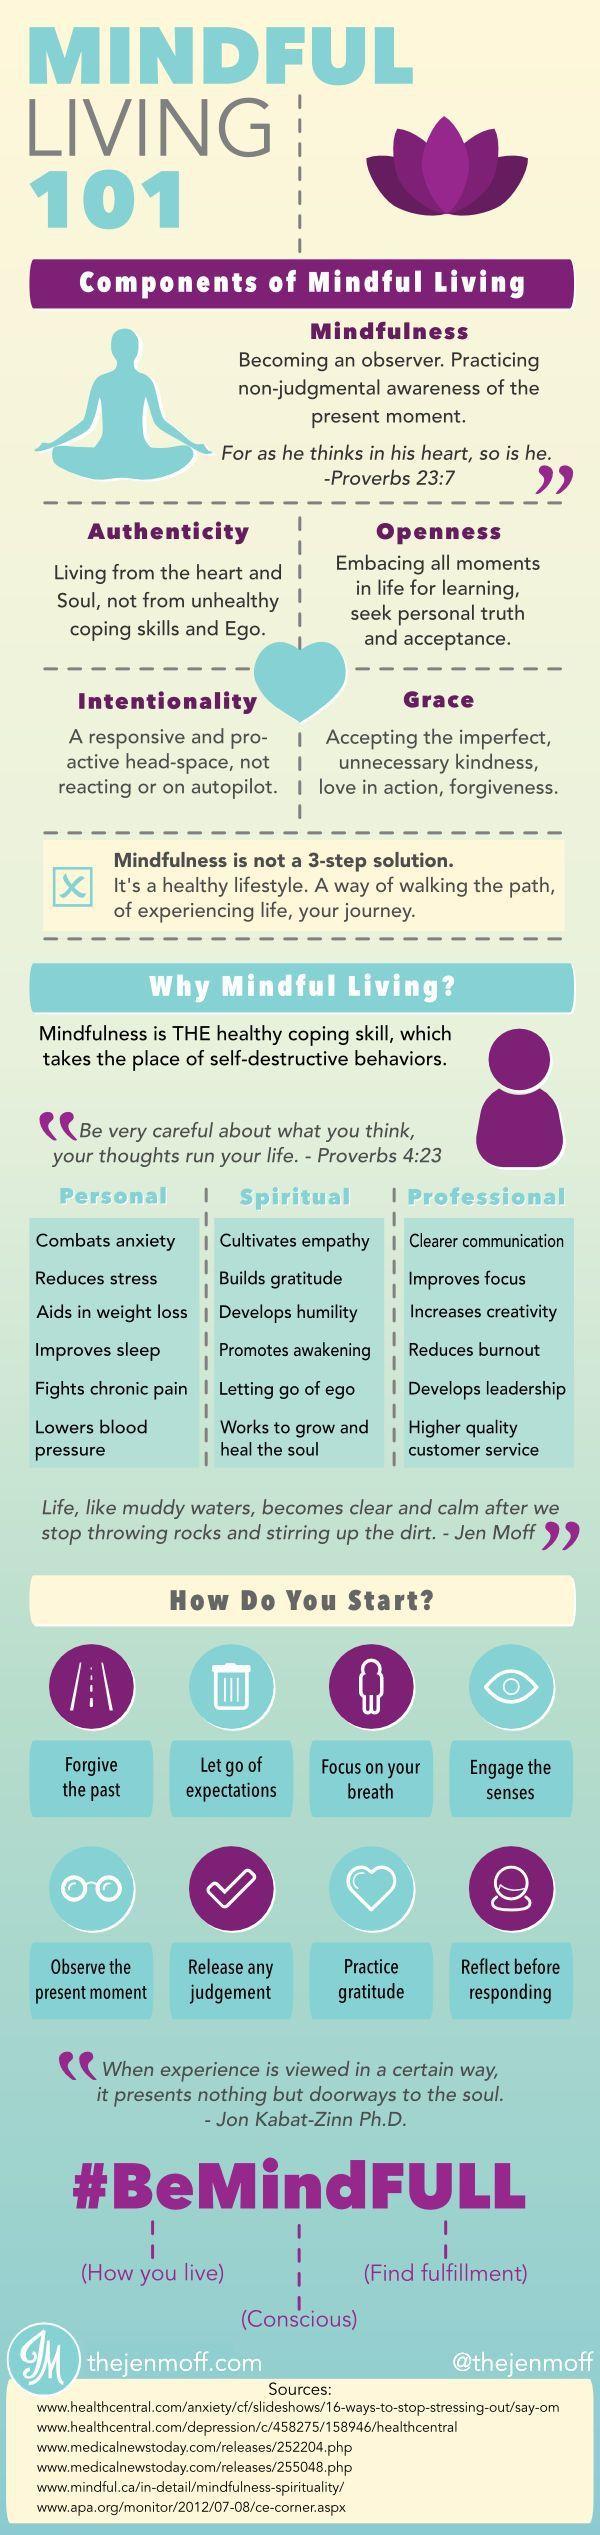 Mindful-Living-101.jpg (600×2535)